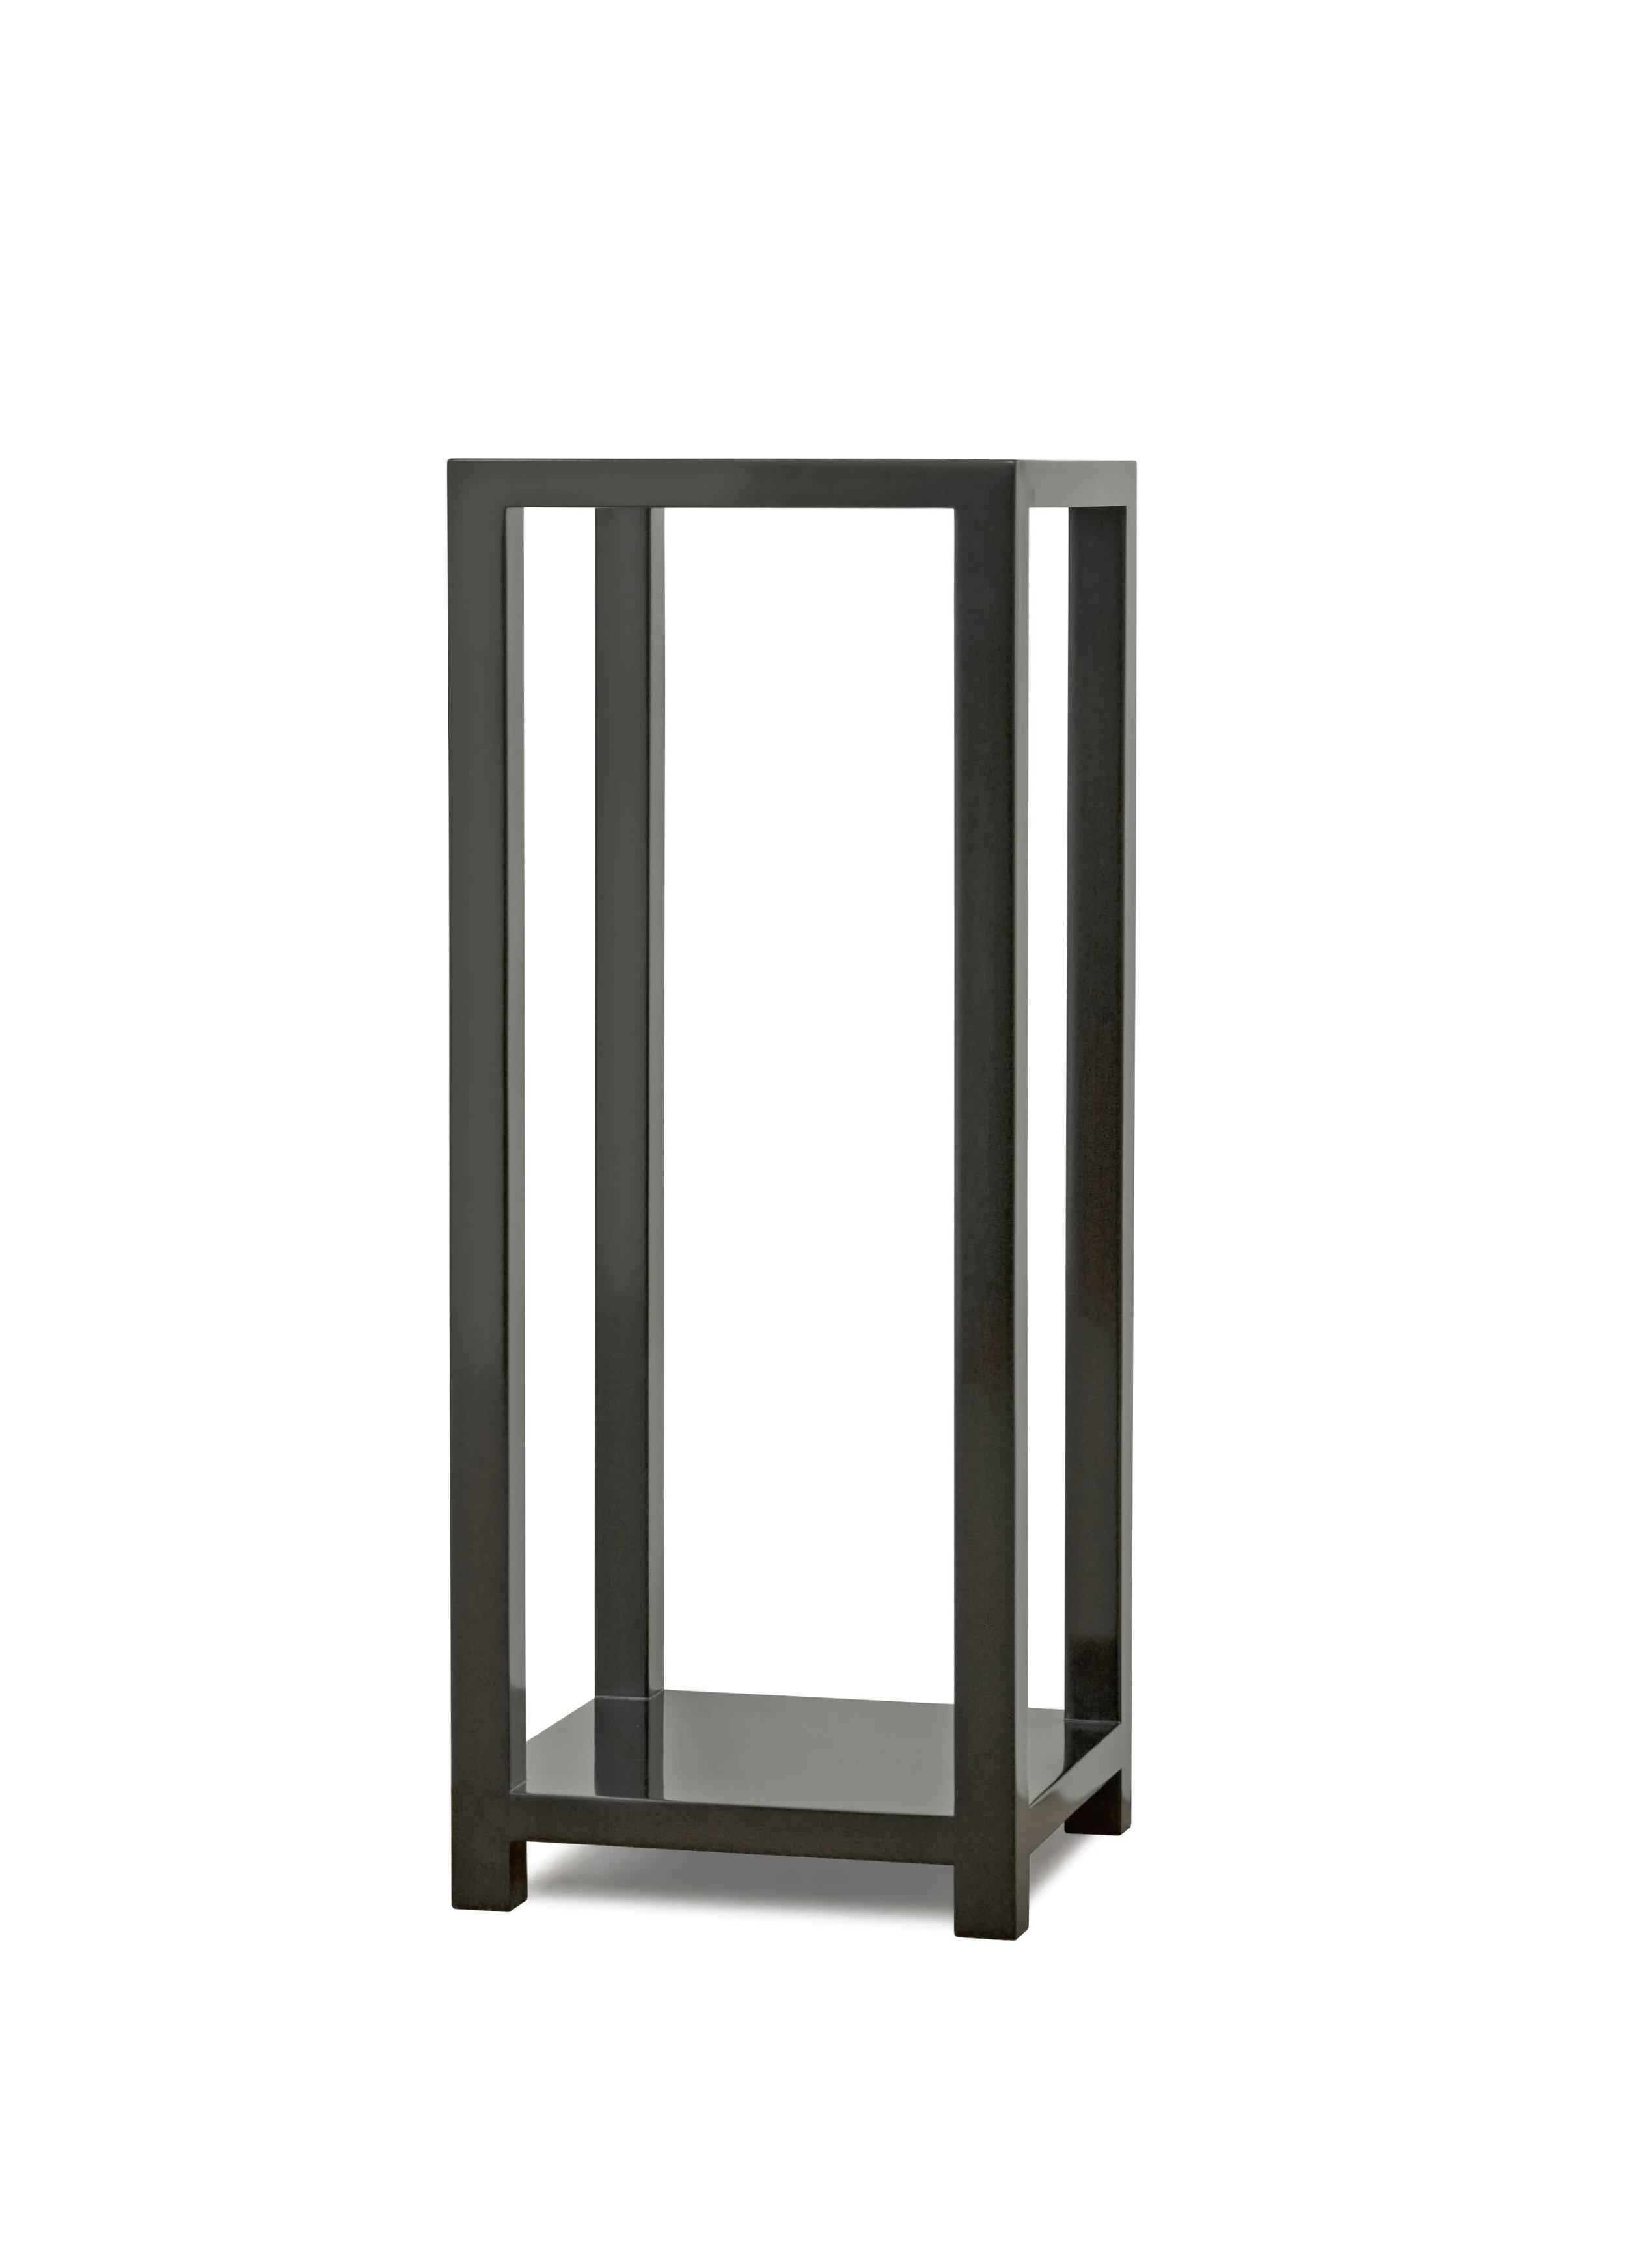 .modern furniture : stand..摩登家具 : 花几....